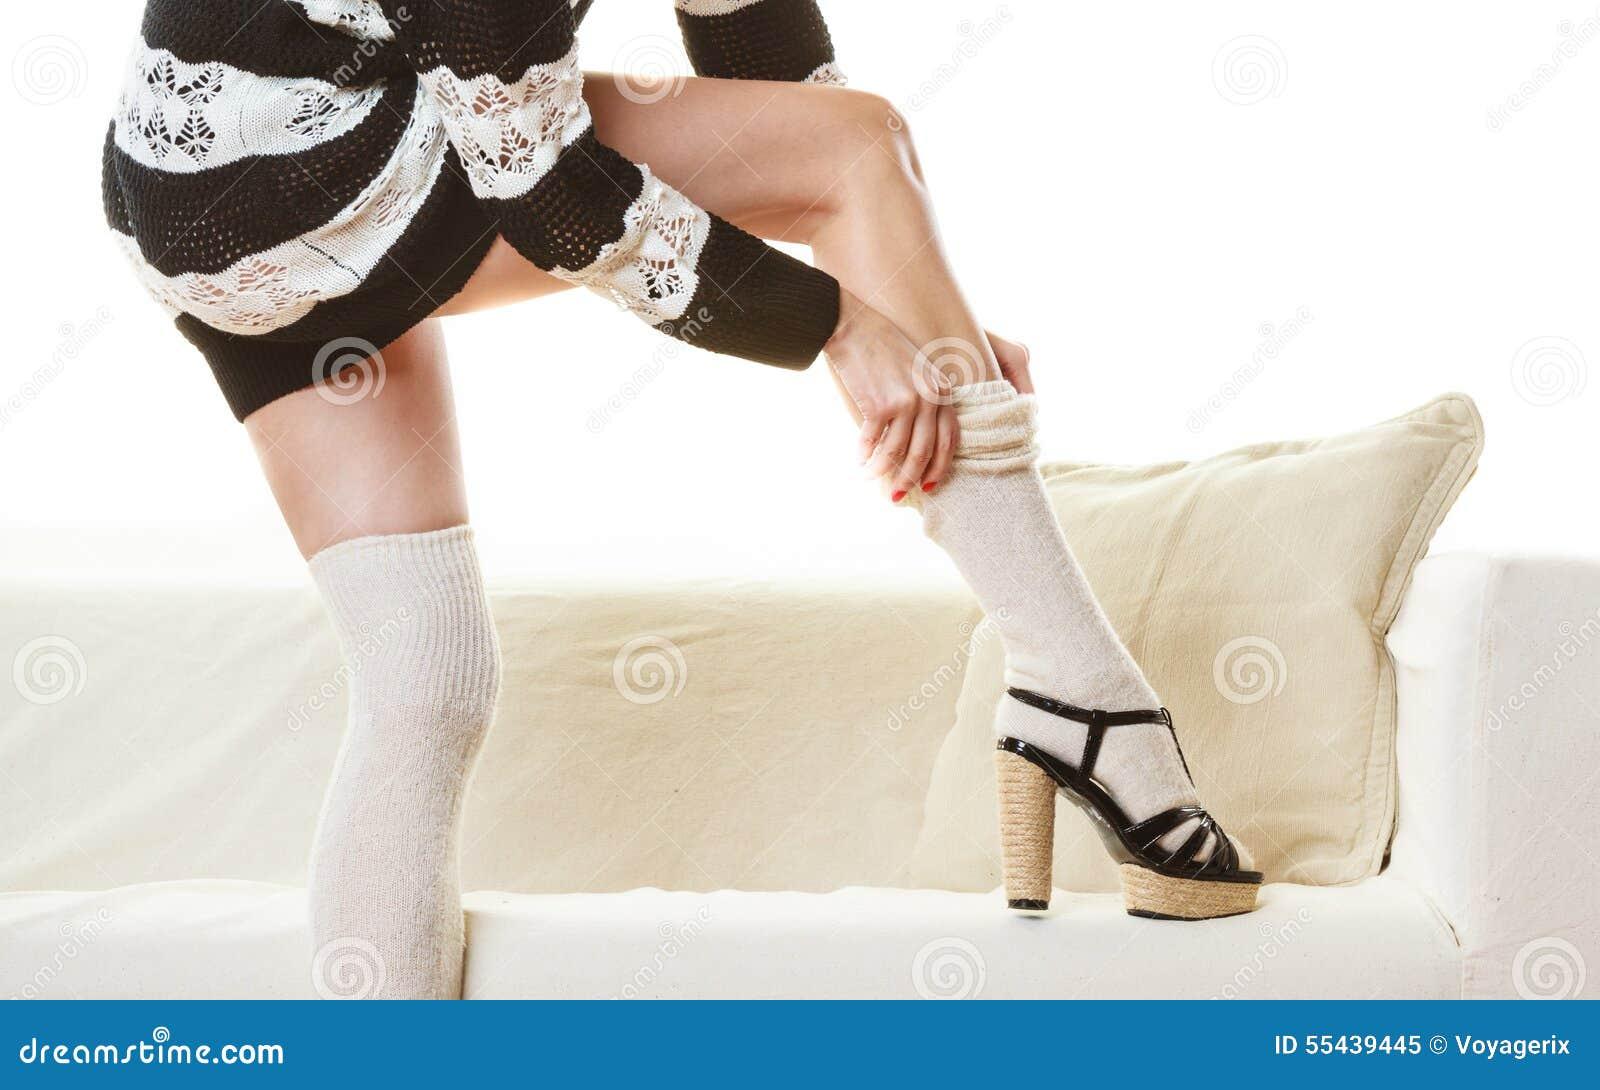 narges-malayalam-pictures-girls-black-woolen-stockings-girl